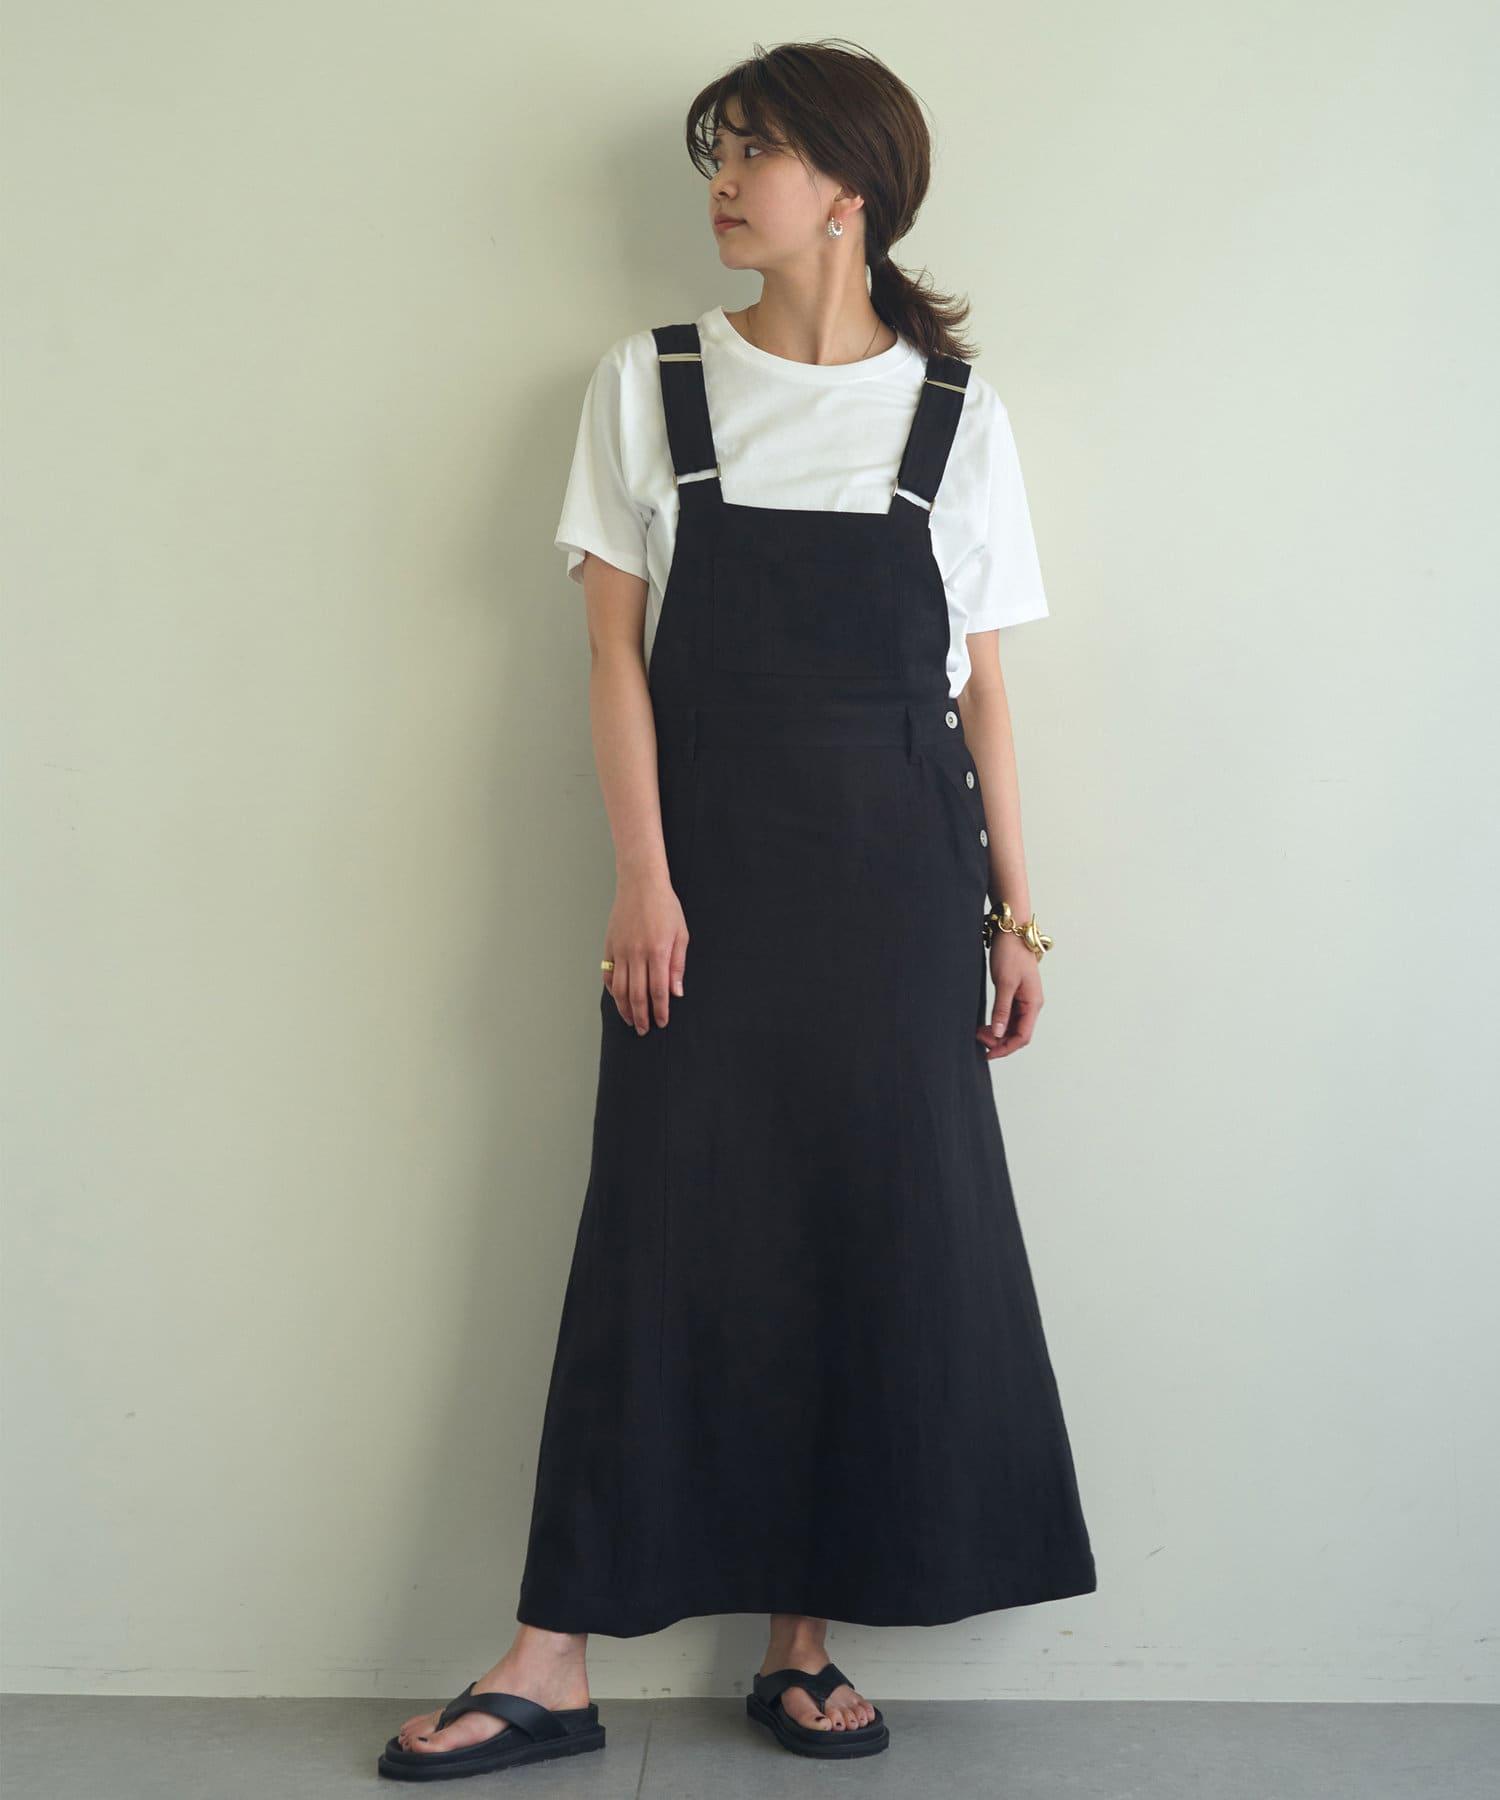 GALLARDAGALANTE(ガリャルダガランテ) リネンジャンパースカート